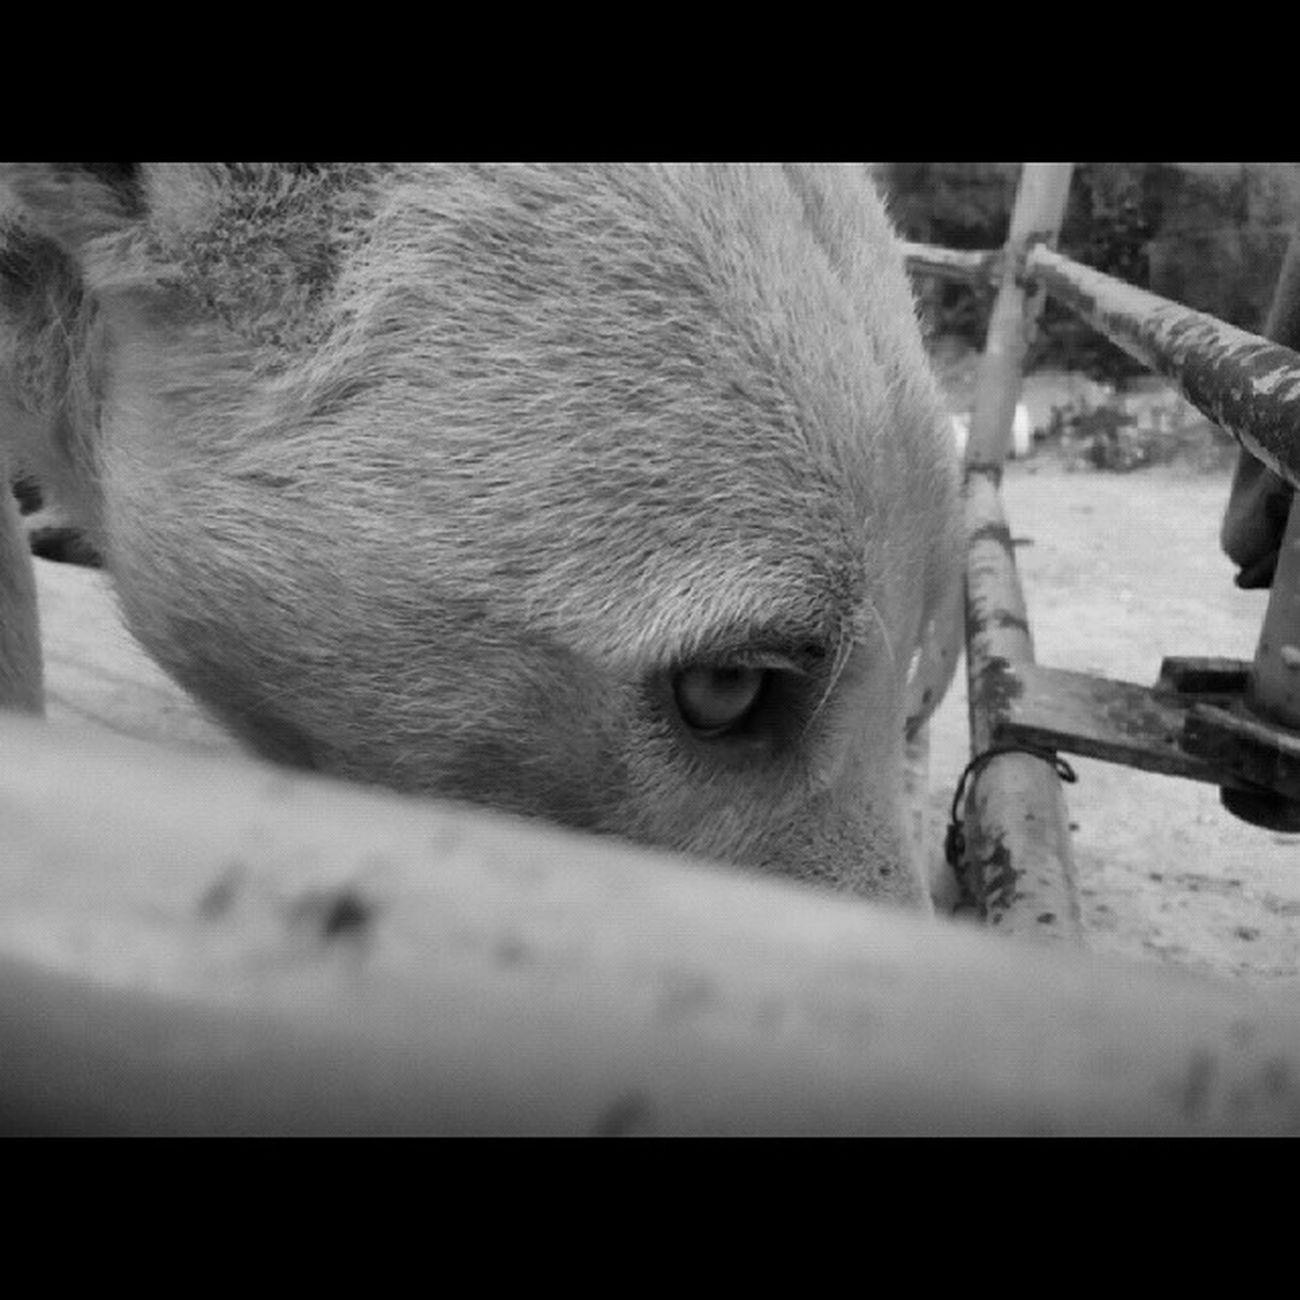 Pipo Picture Gallery Dog FotoDelDia Siguemeytesigo Instalike Instamoment Olvido Miradas Que Dicen Todo Dog FotoDelDia Instalike Animalista Perro Blanco y Negro Gallery Picture Folowme Like Tristeza miradavacía